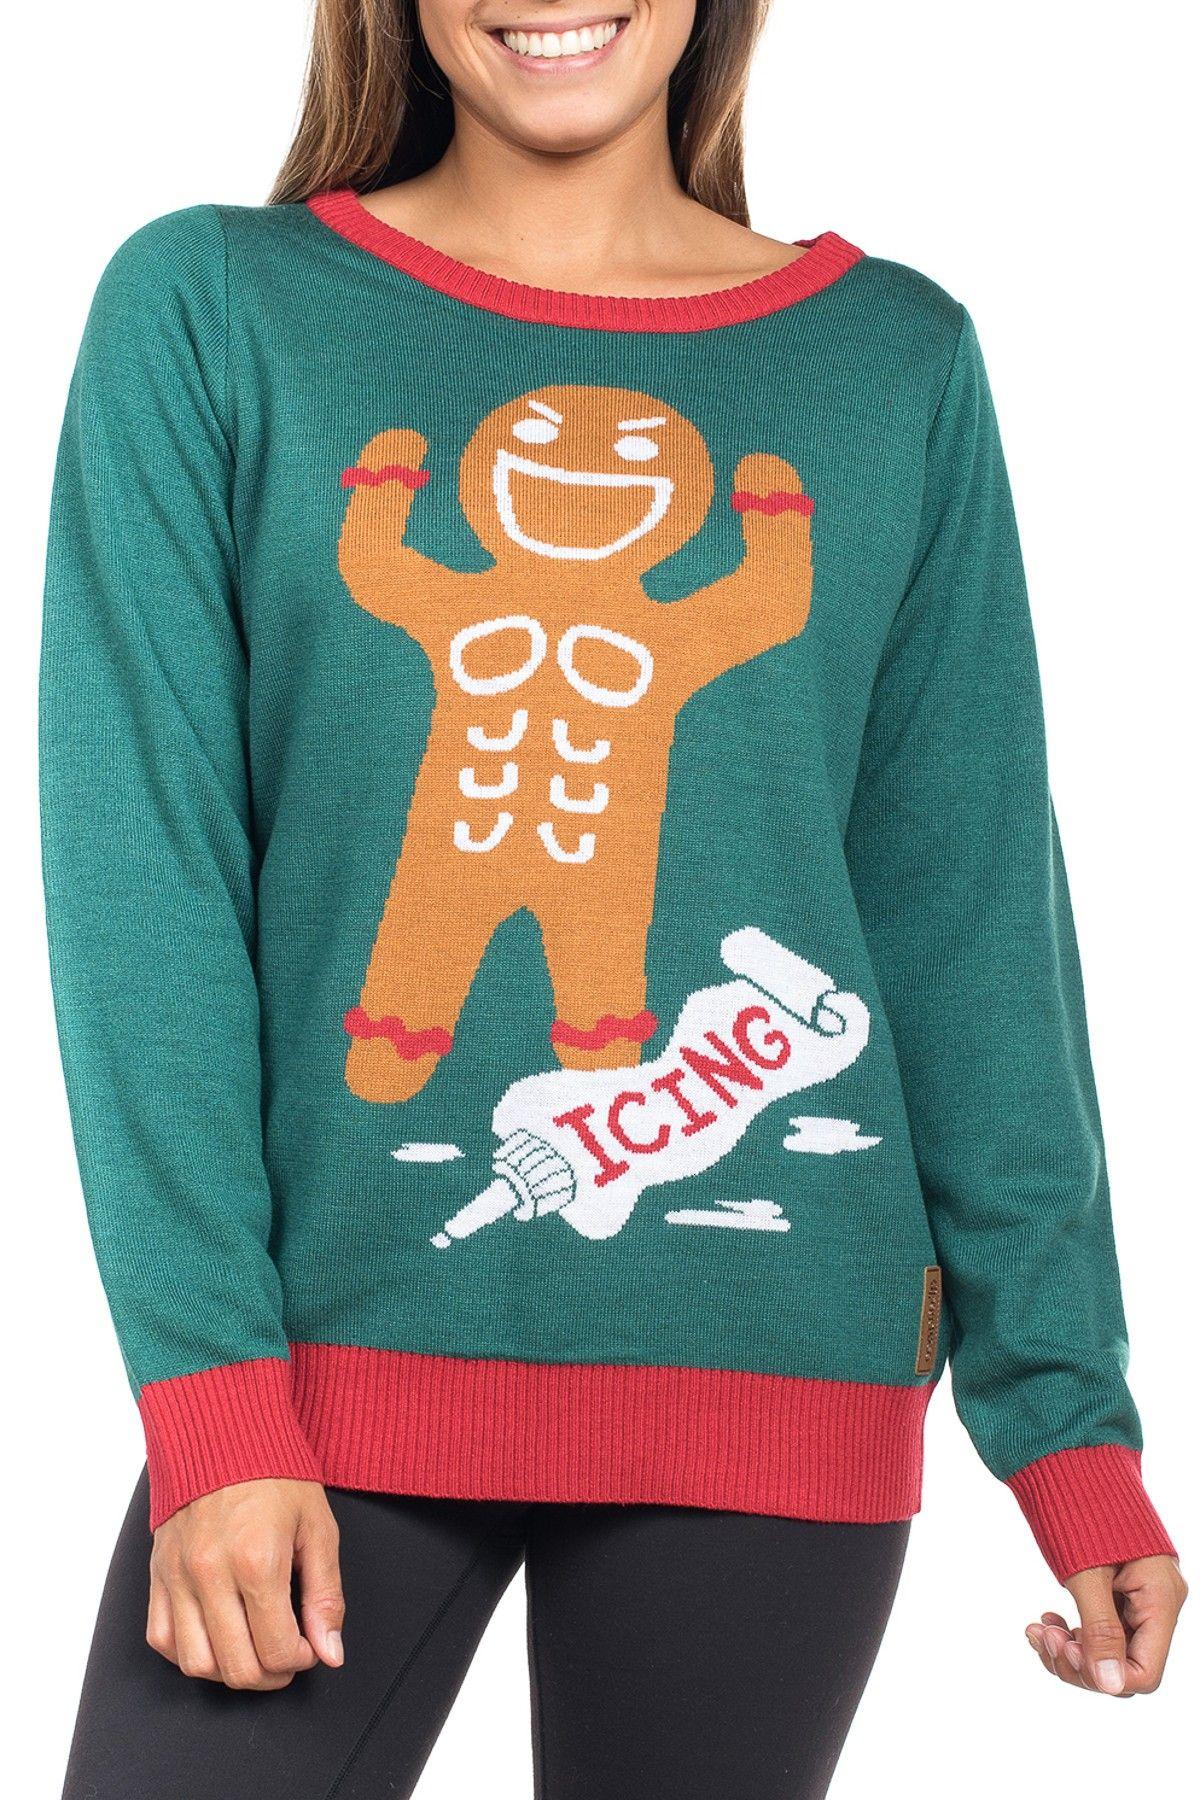 Doryti Soccer Ugly Christmas Sweater Funny Holiday Unisex Sweatshirt tee